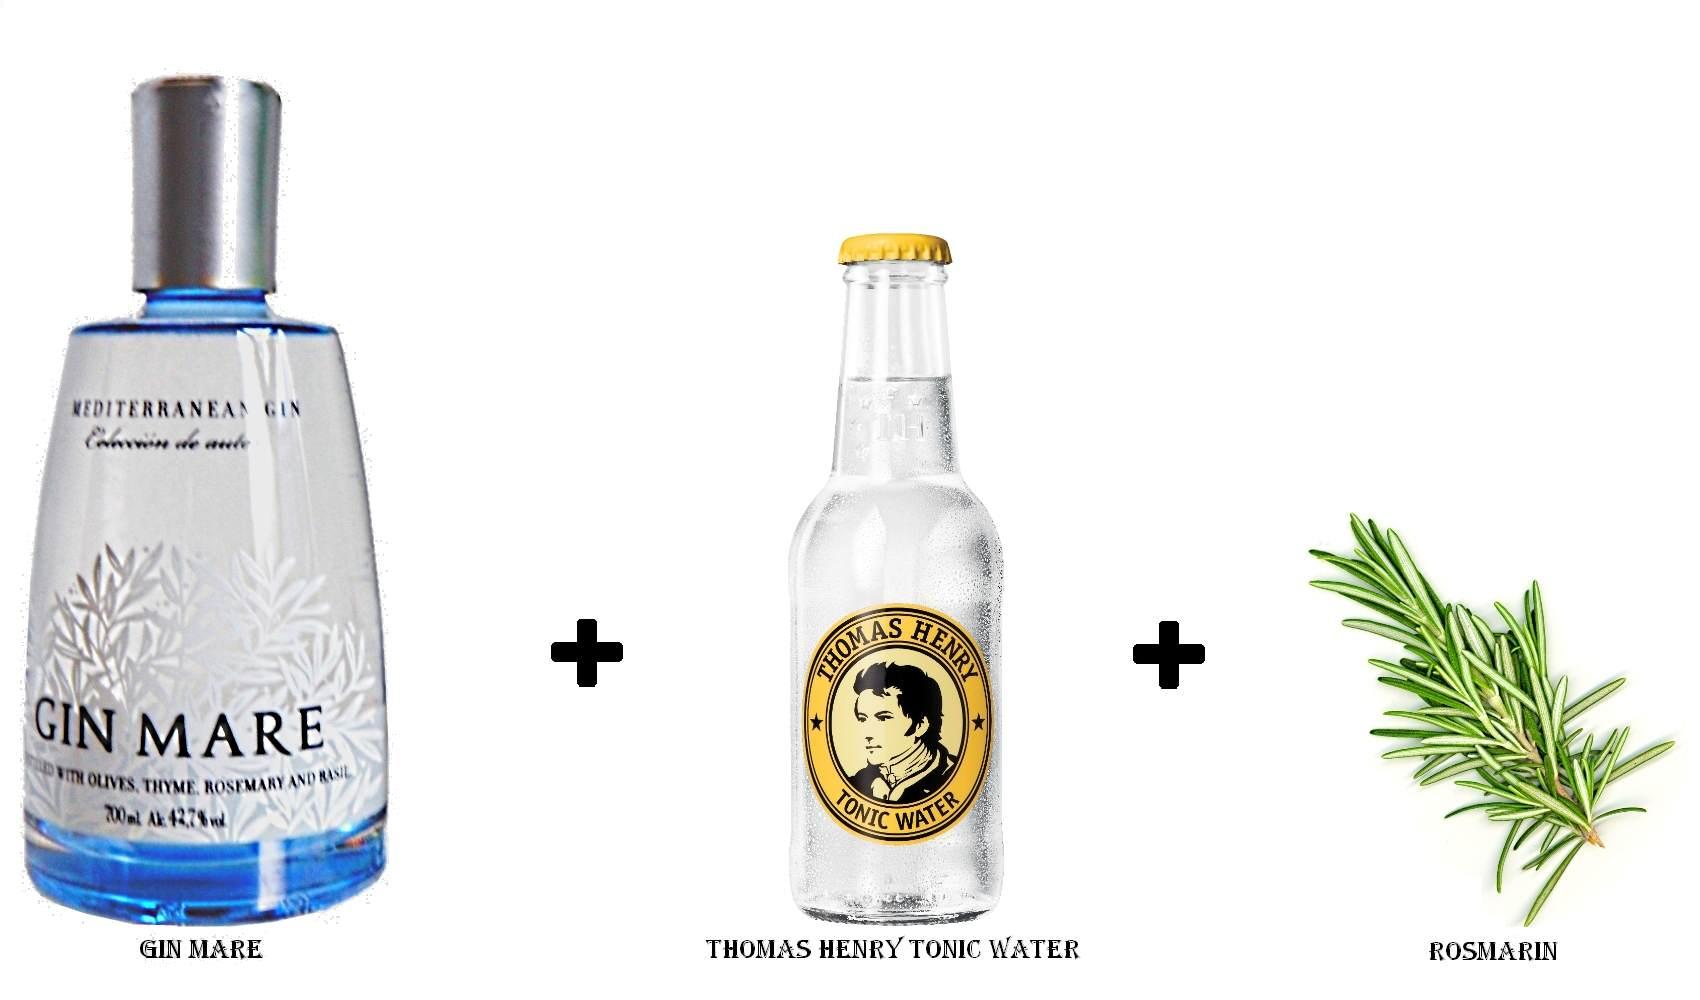 Gin Mare + Thomas Henry Tonic Water + Rosmarin